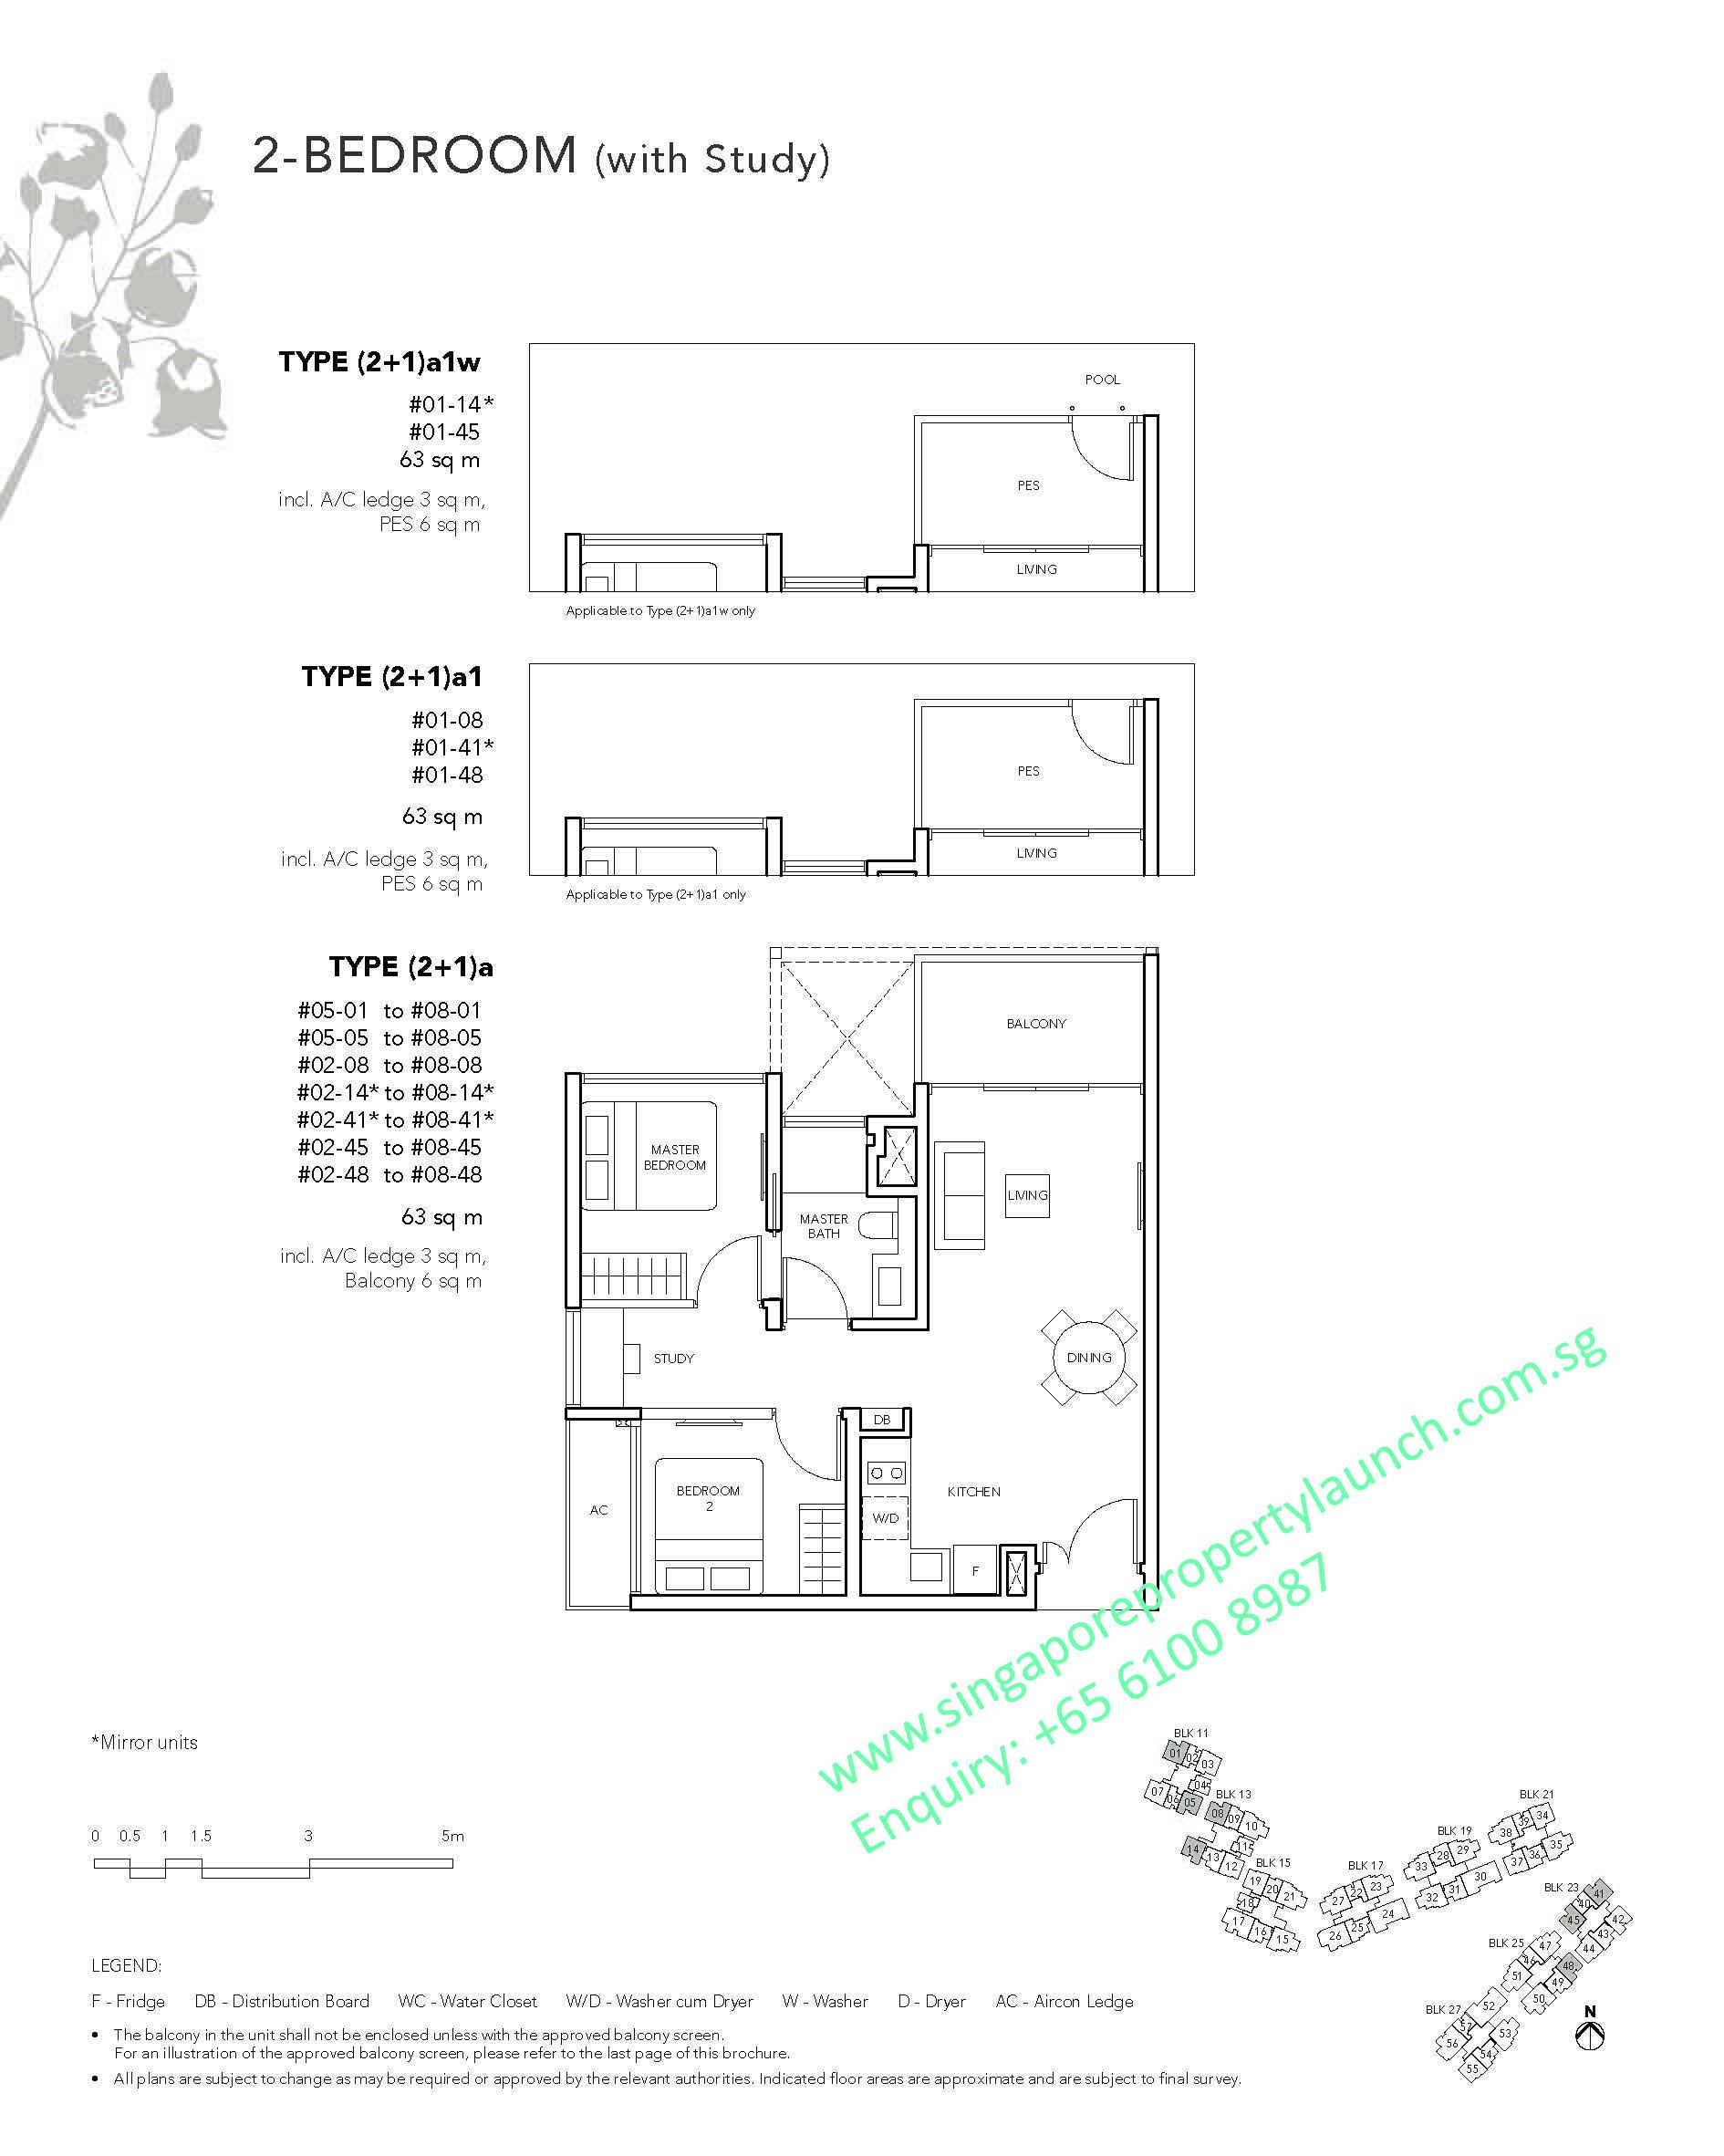 The Jovell Floor Plan 2 Bedroom Study Type 2 1a 6100 8987 Visit Showflat For Developer Price